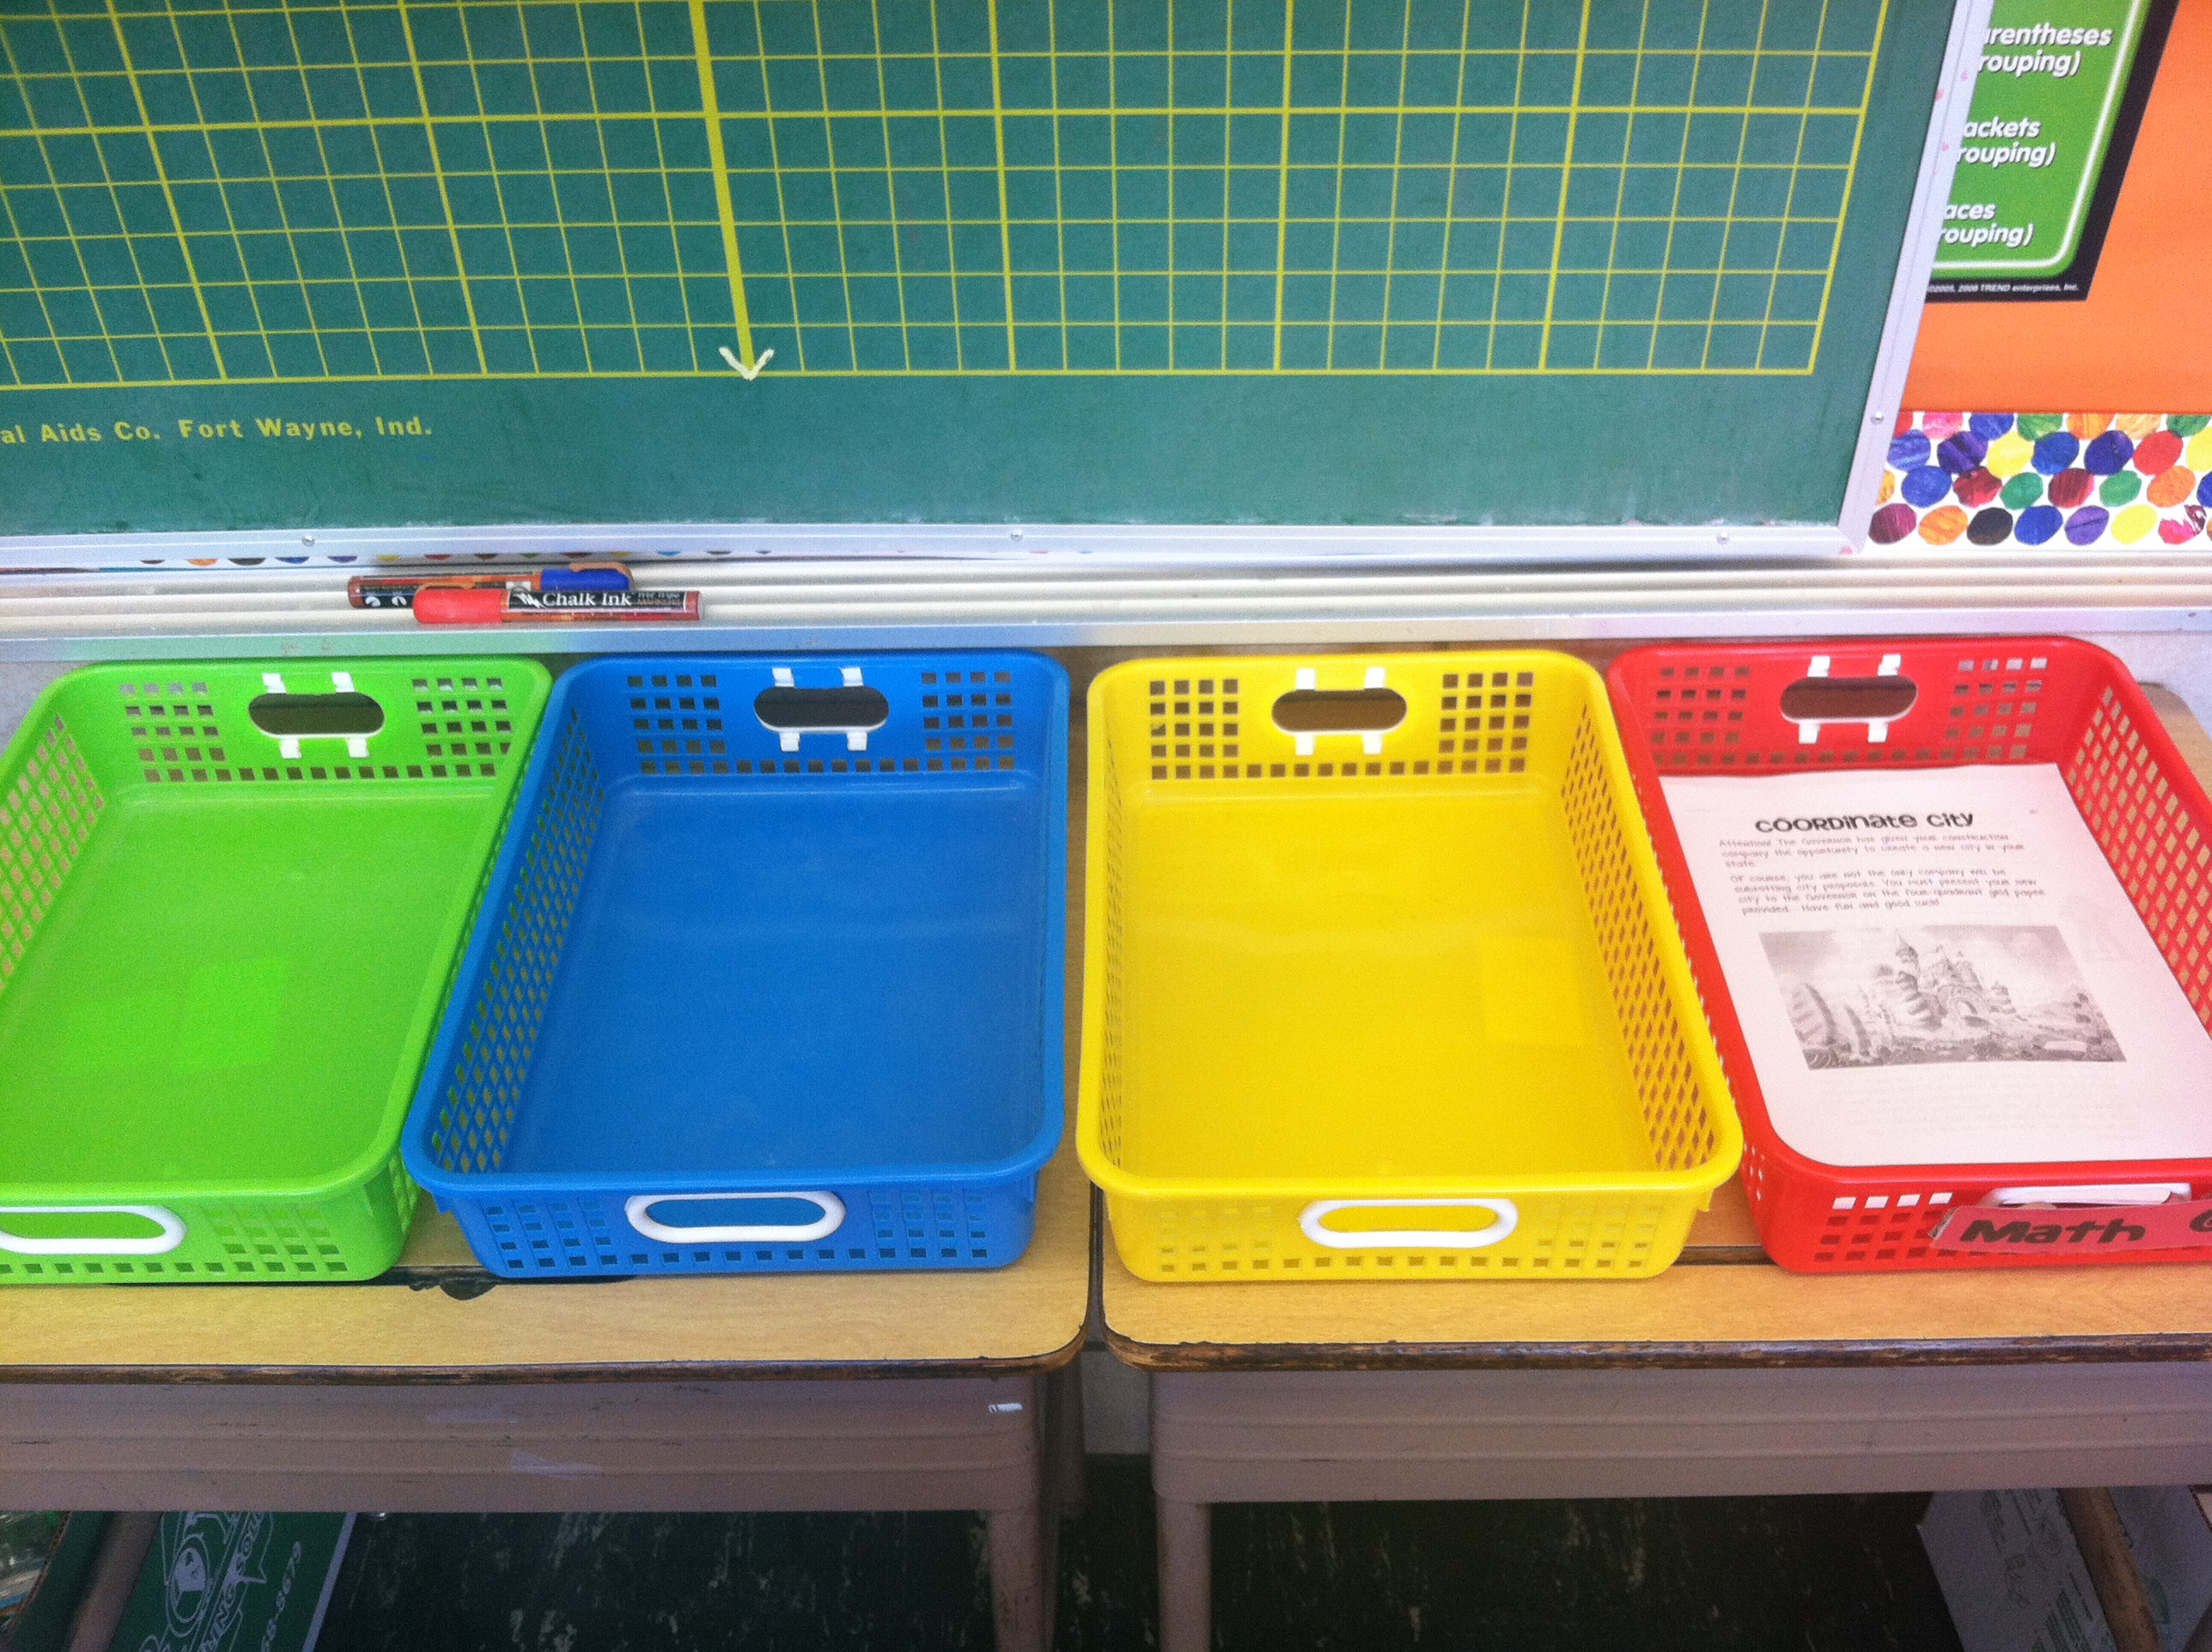 we also provide grade 7 science homework help and grade